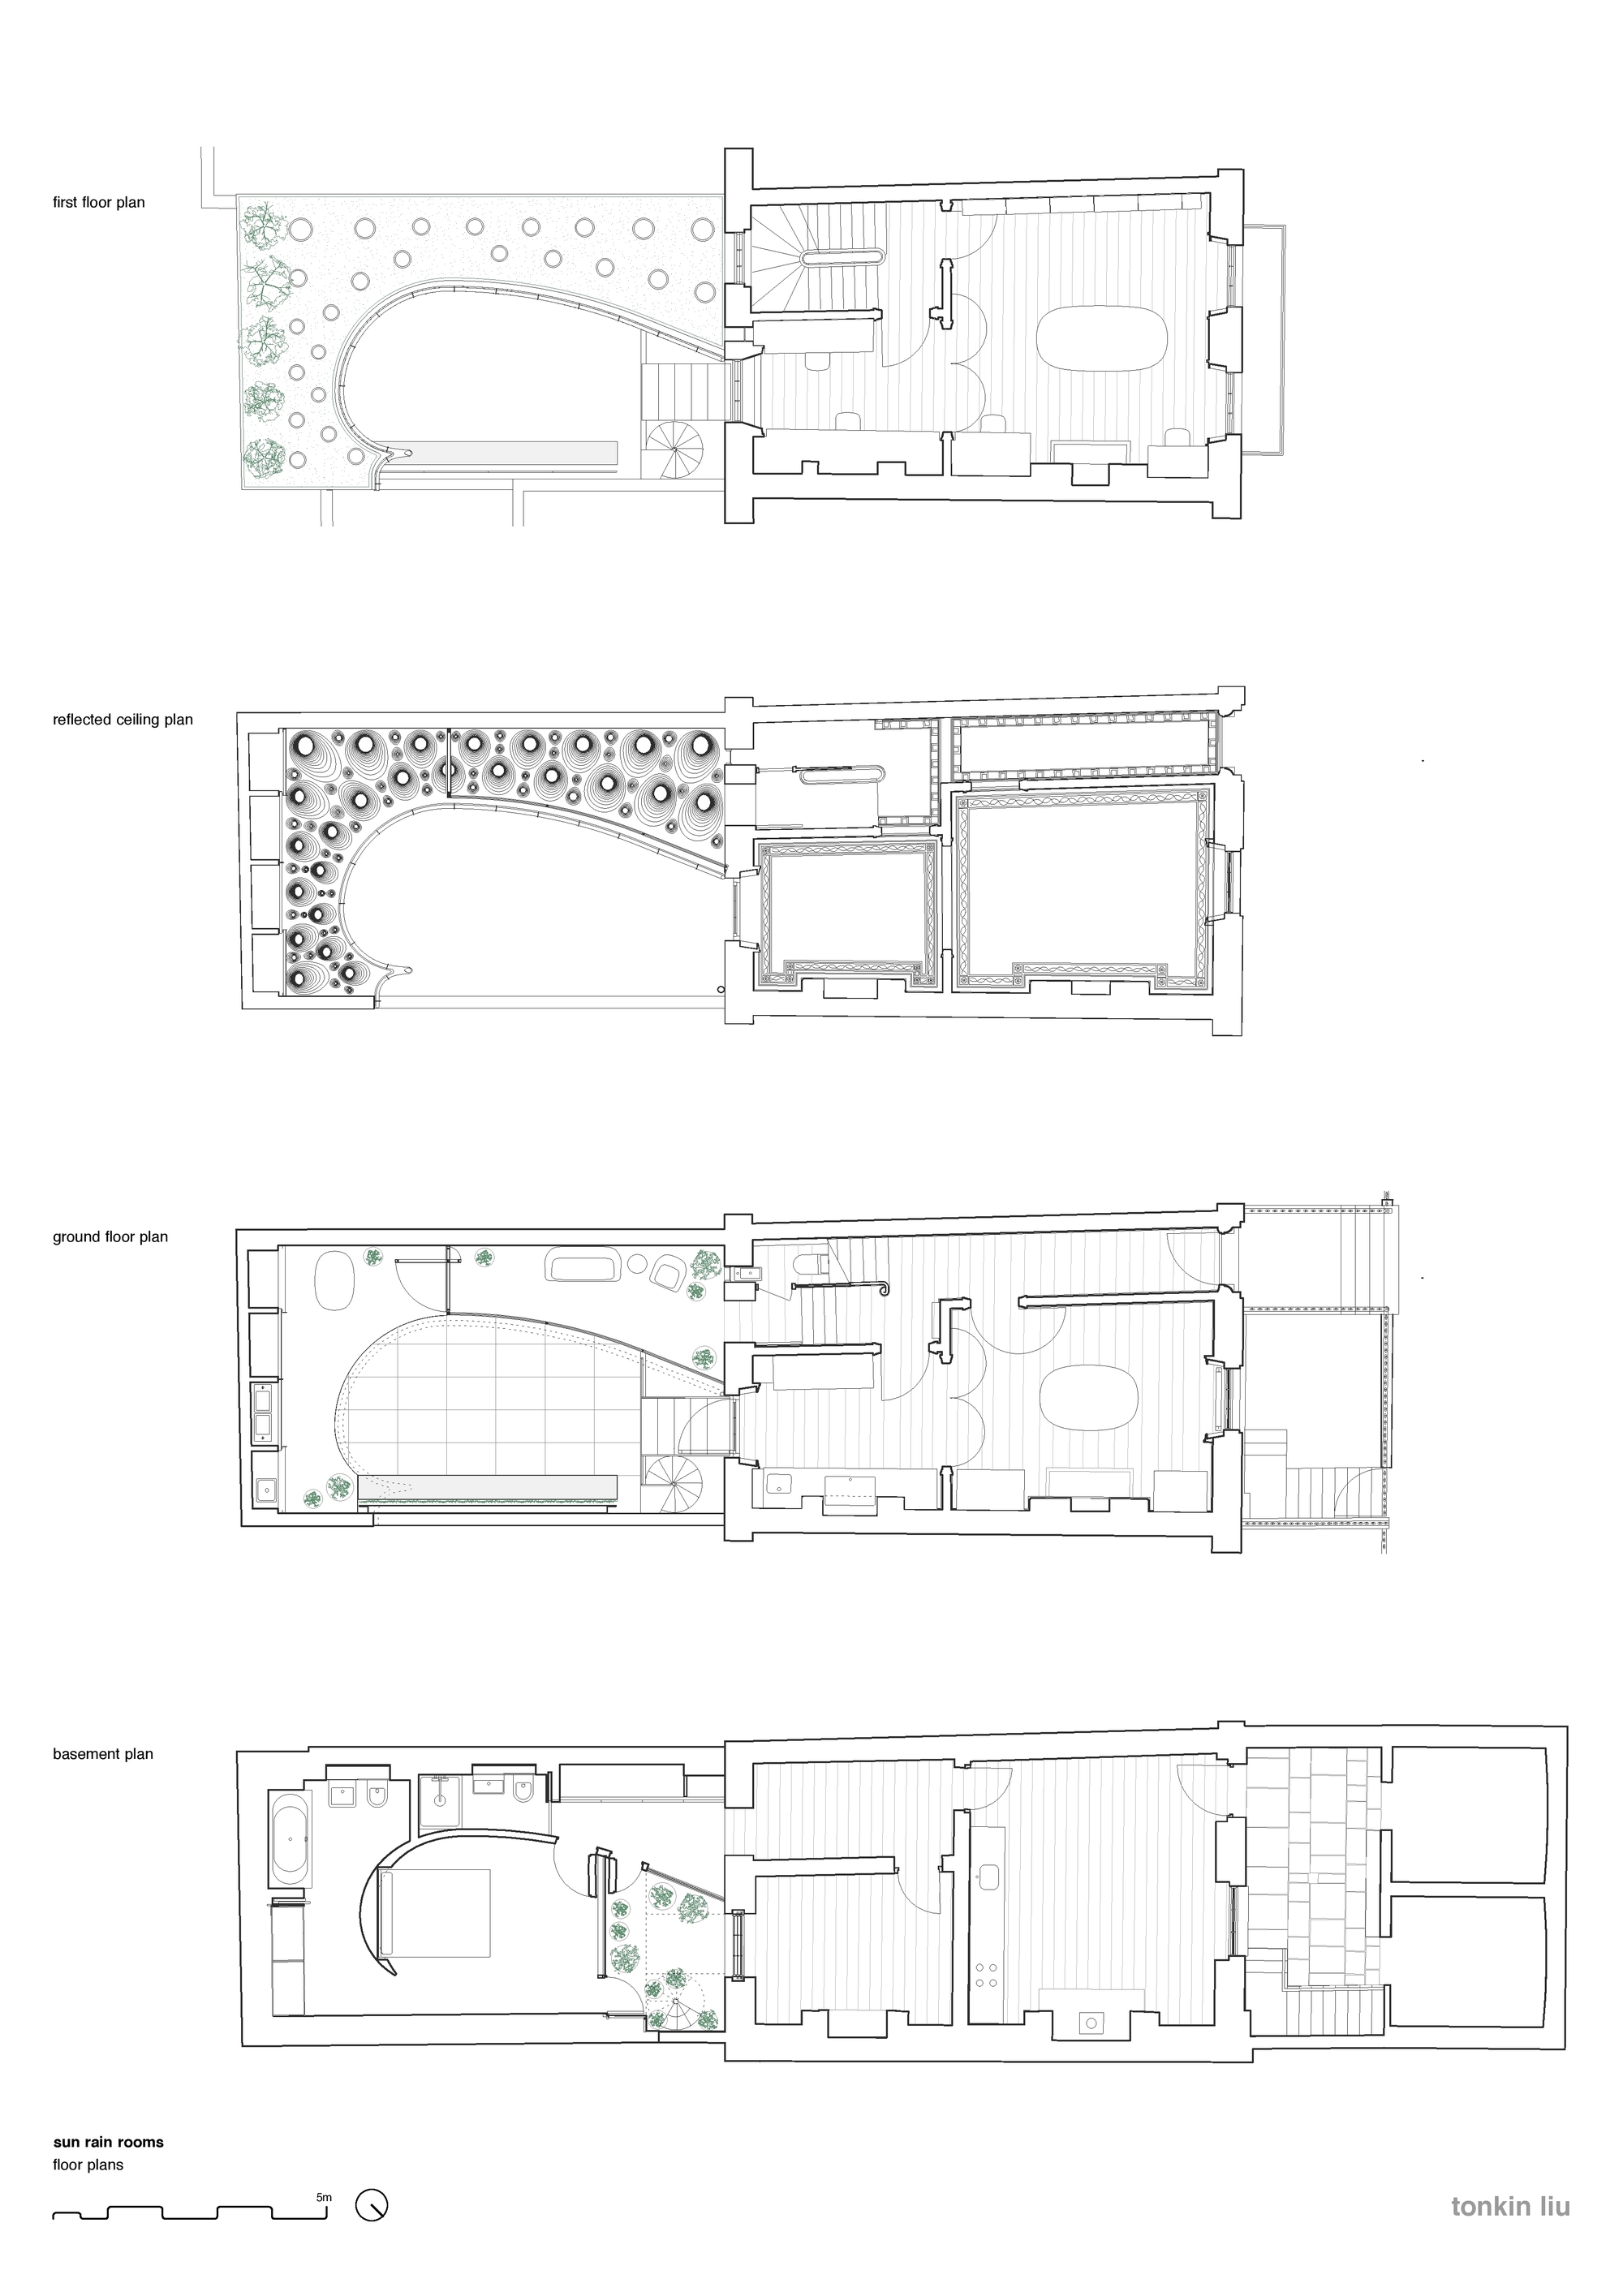 163_04_floor_plans0001.jpg